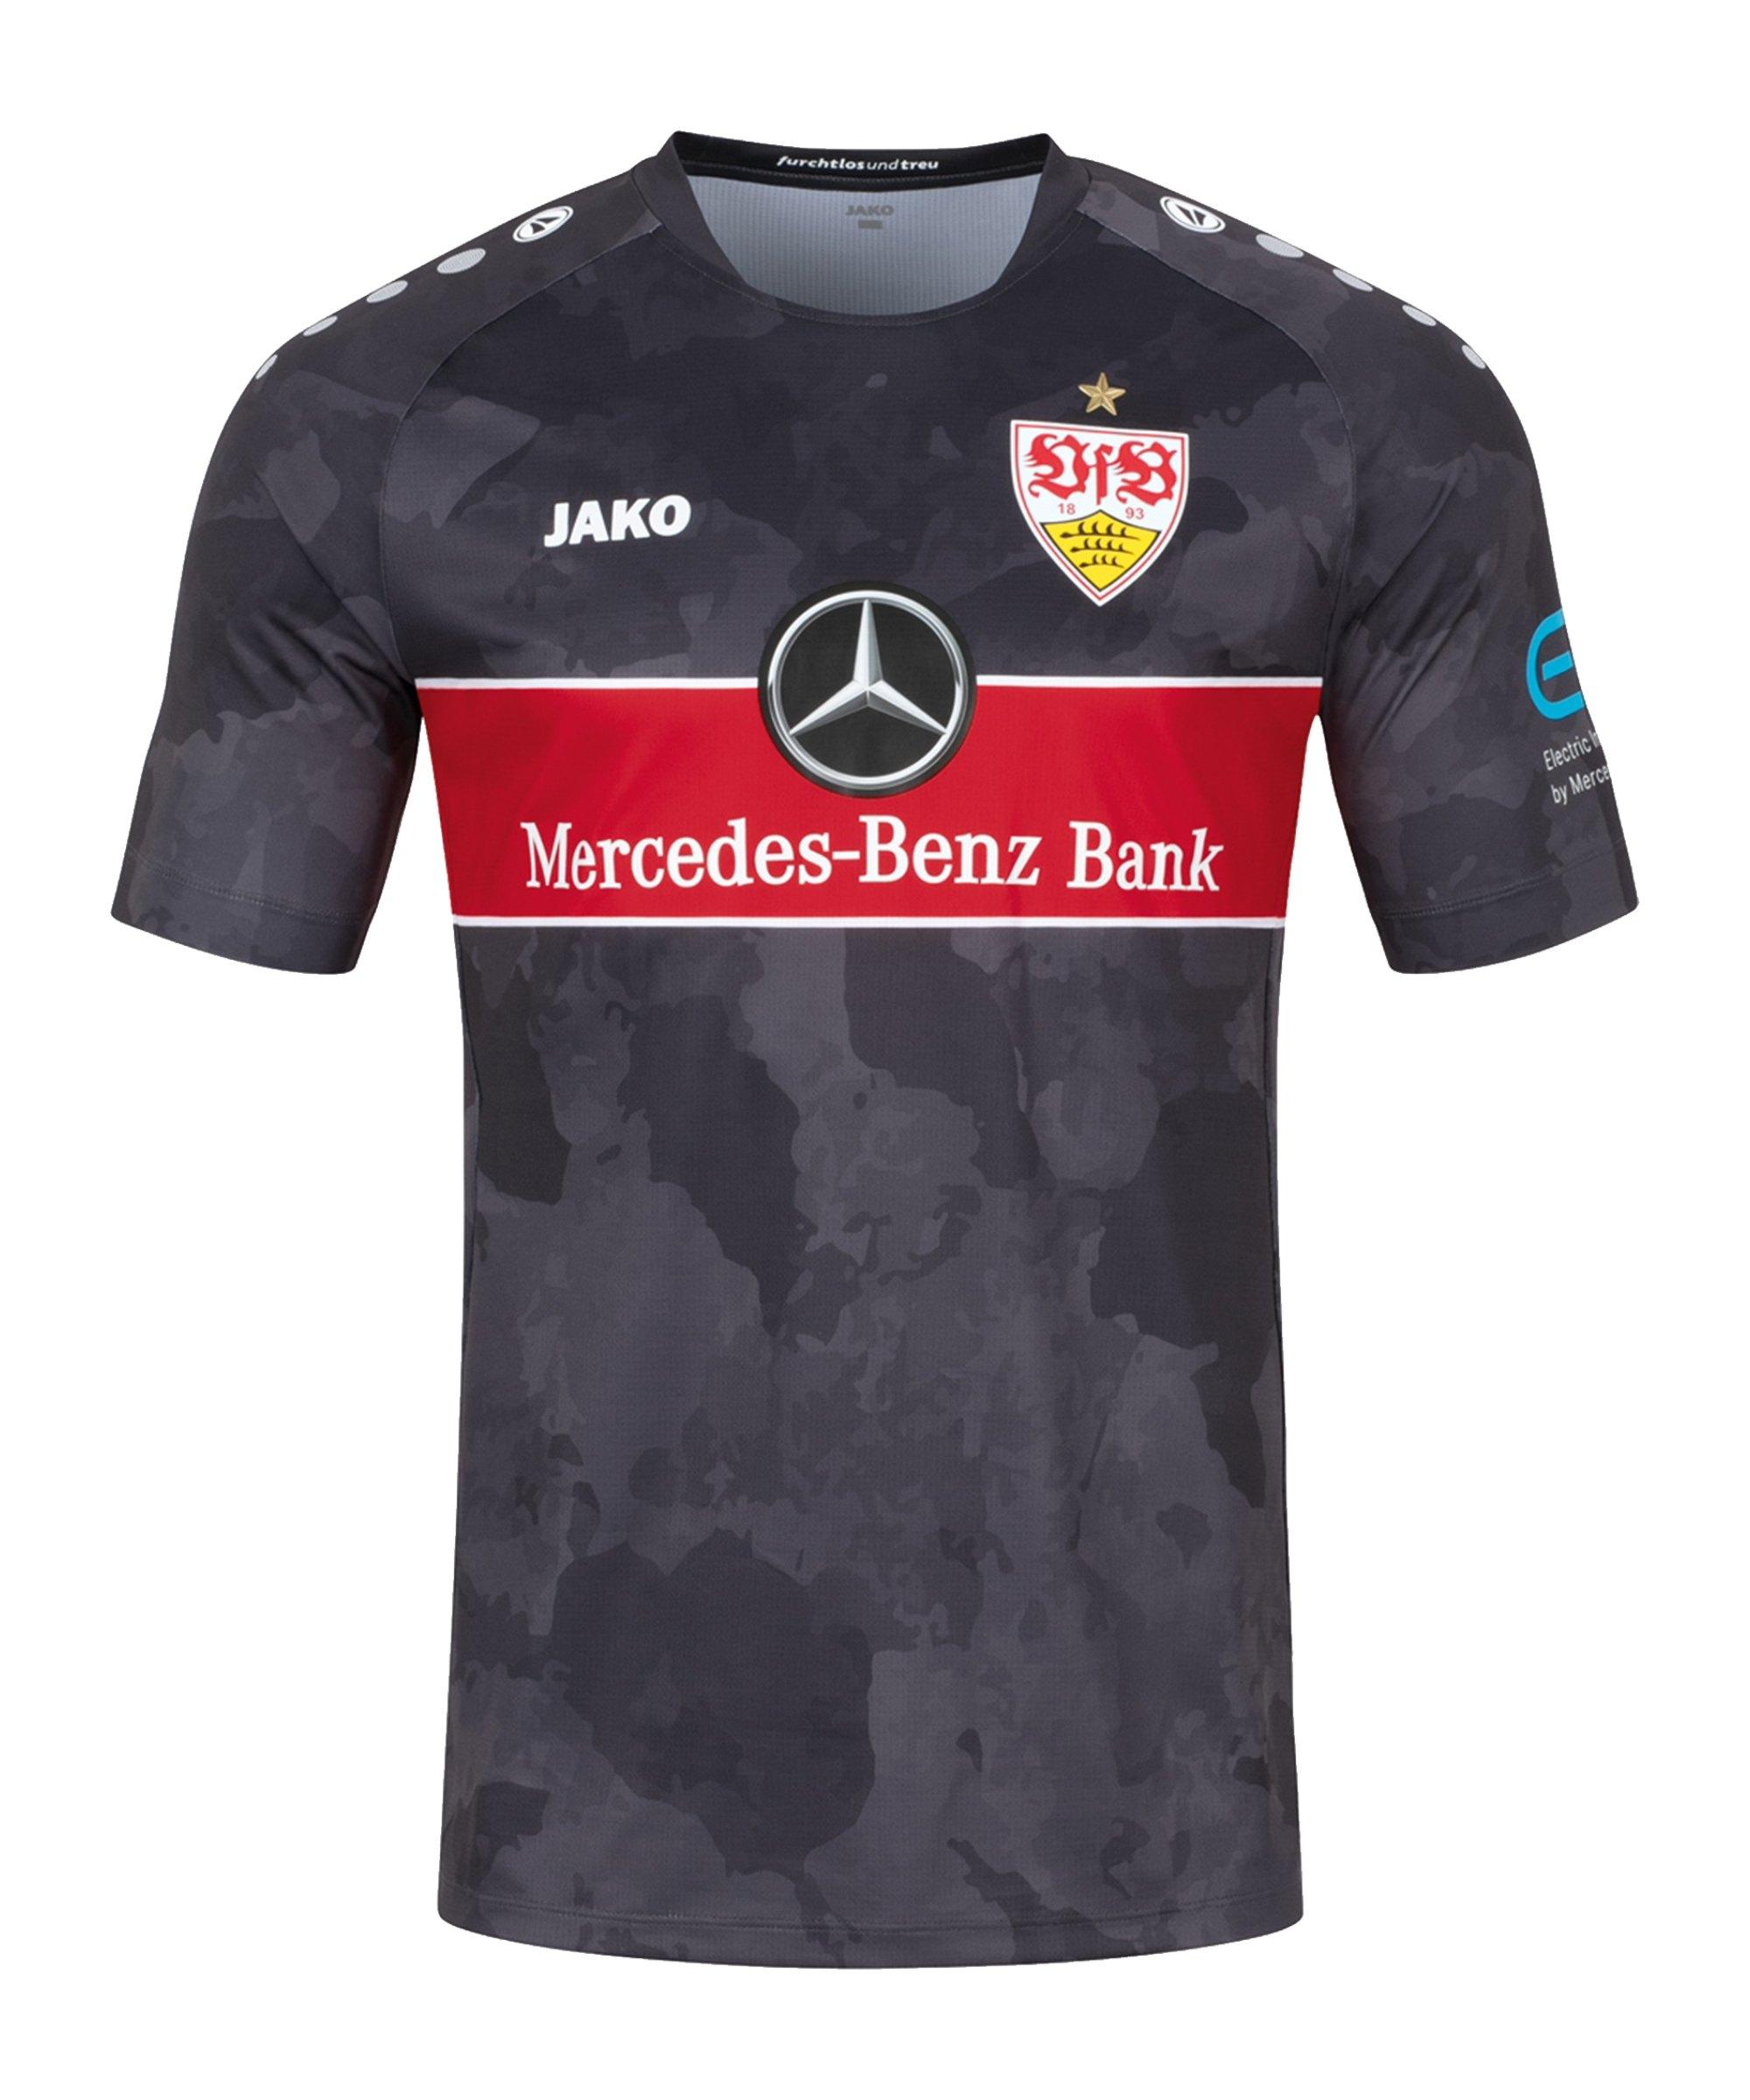 JAKO VfB Stuttgart Trikot 3rd 2021/2022 Grau F683 - grau